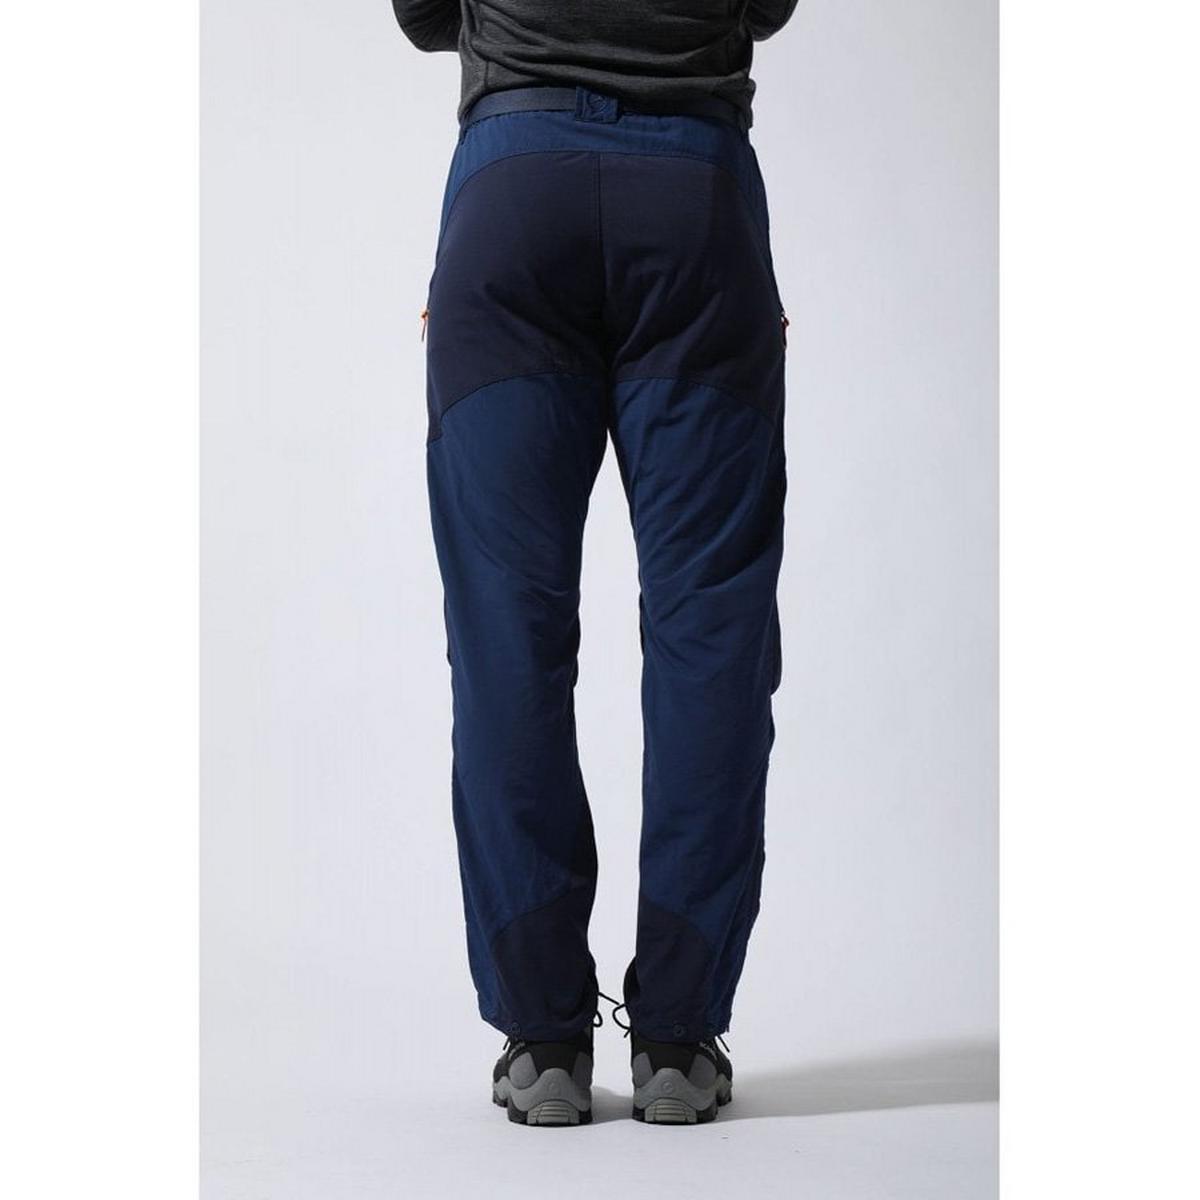 Montane Terra Pant Short Leg